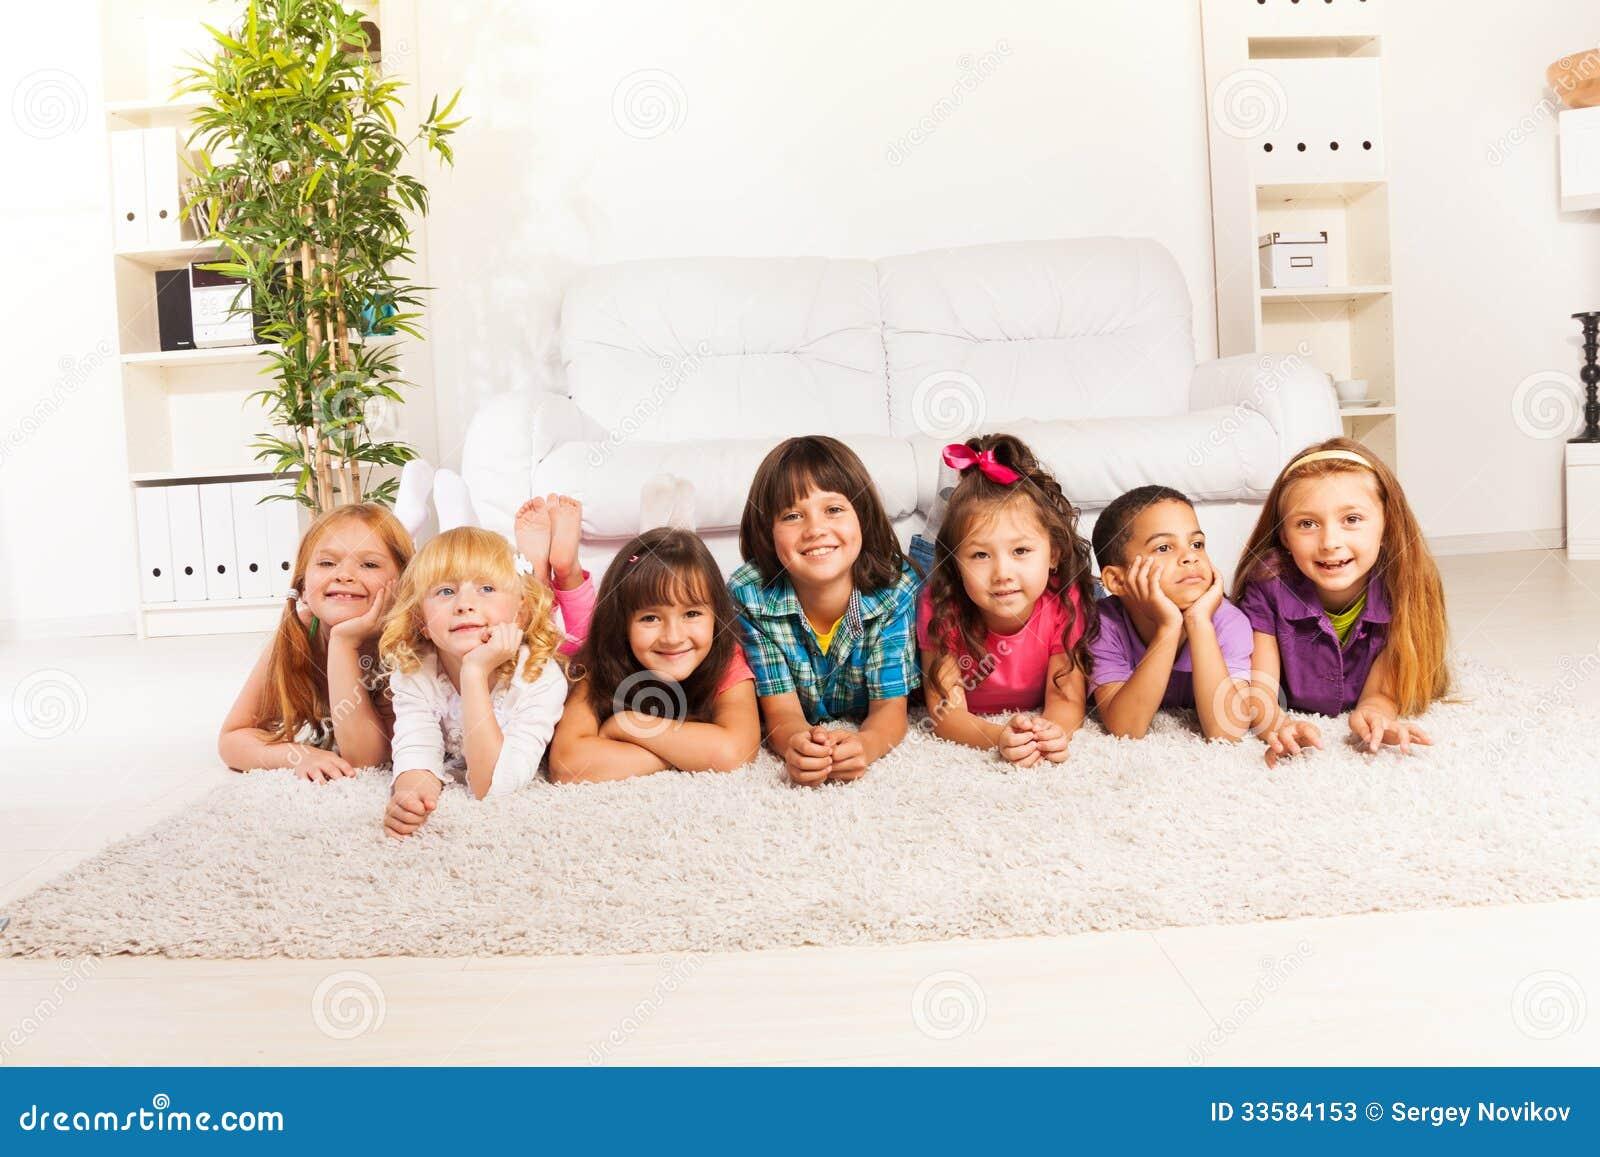 group homes boys girls